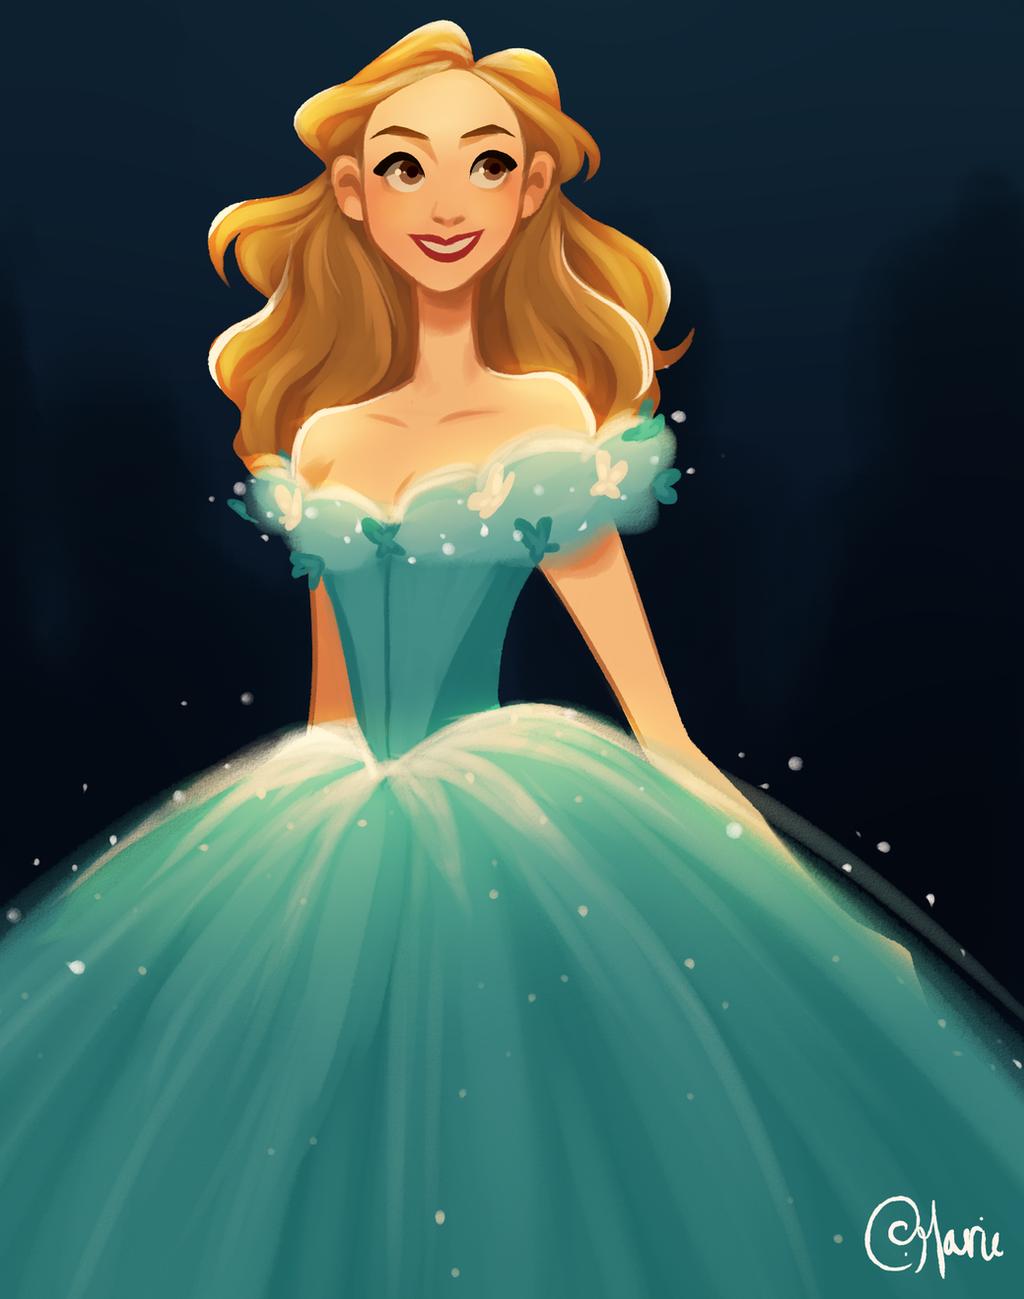 249 Best Images About Mens Fashion On Pinterest: Cinderella By TheGingerMenace123 On DeviantArt